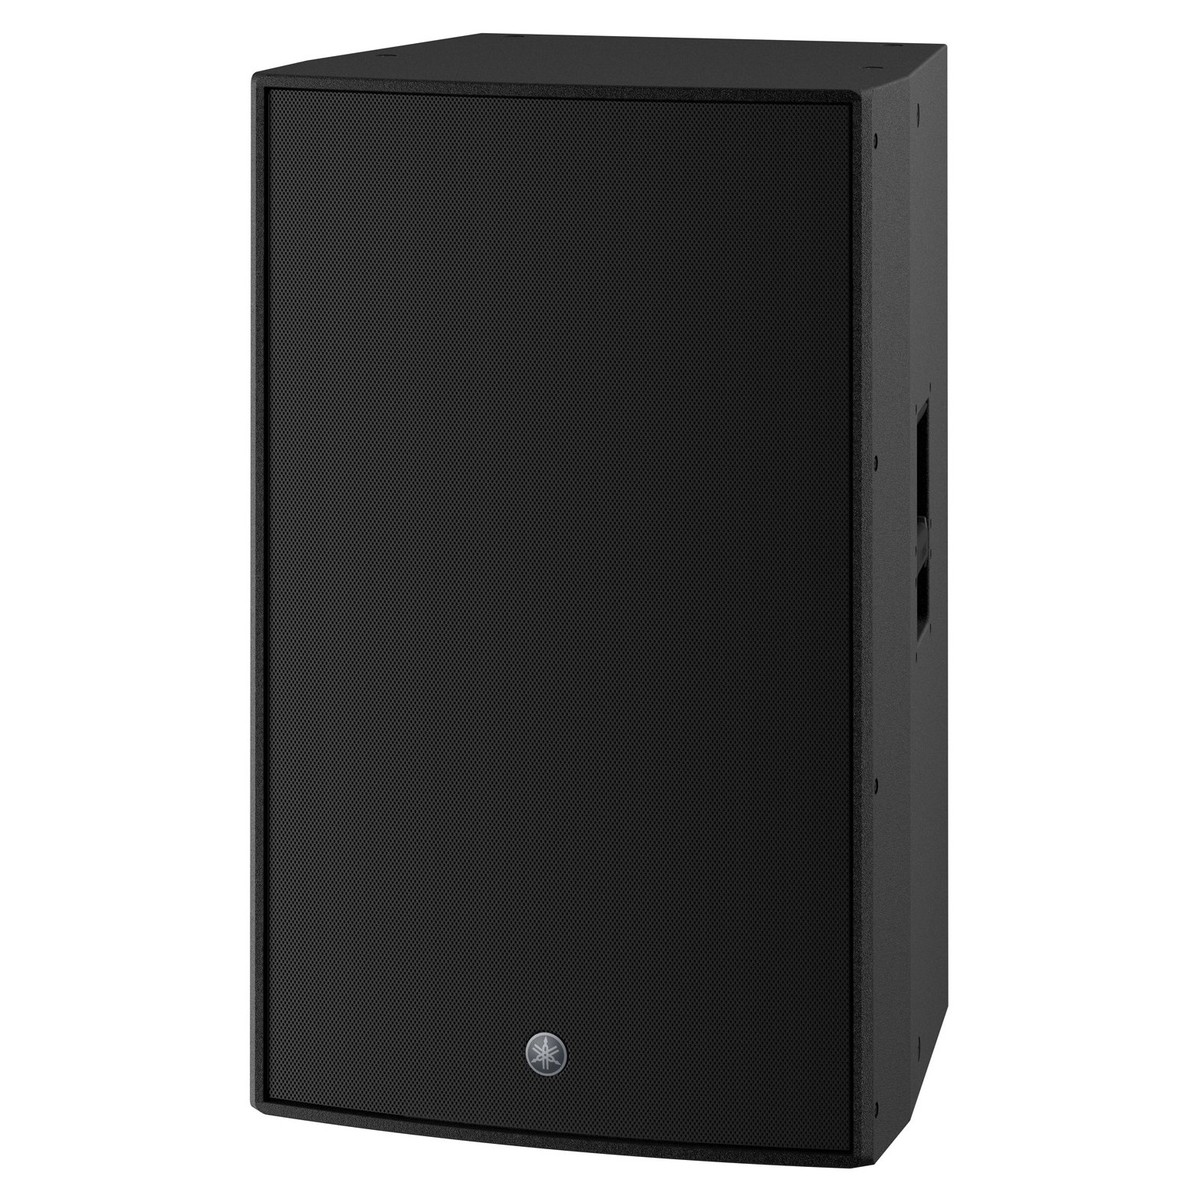 Yamaha DZR315 15\'\' 3-Way Active PA Speaker at Gear4music.com